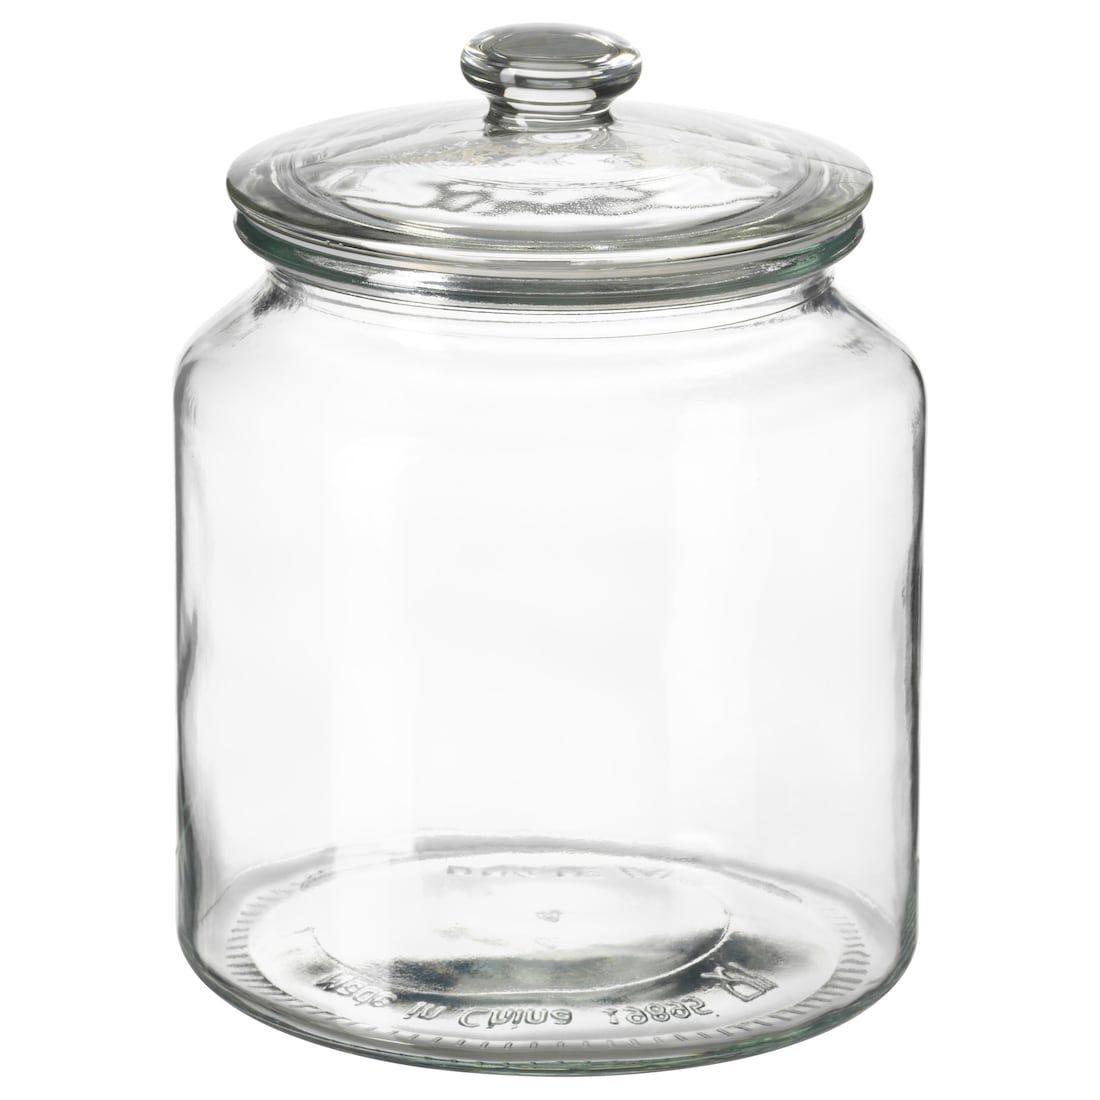 VARDAGEN - IKEA  Ikea jars, Glass jars with lids, Kitchen jars